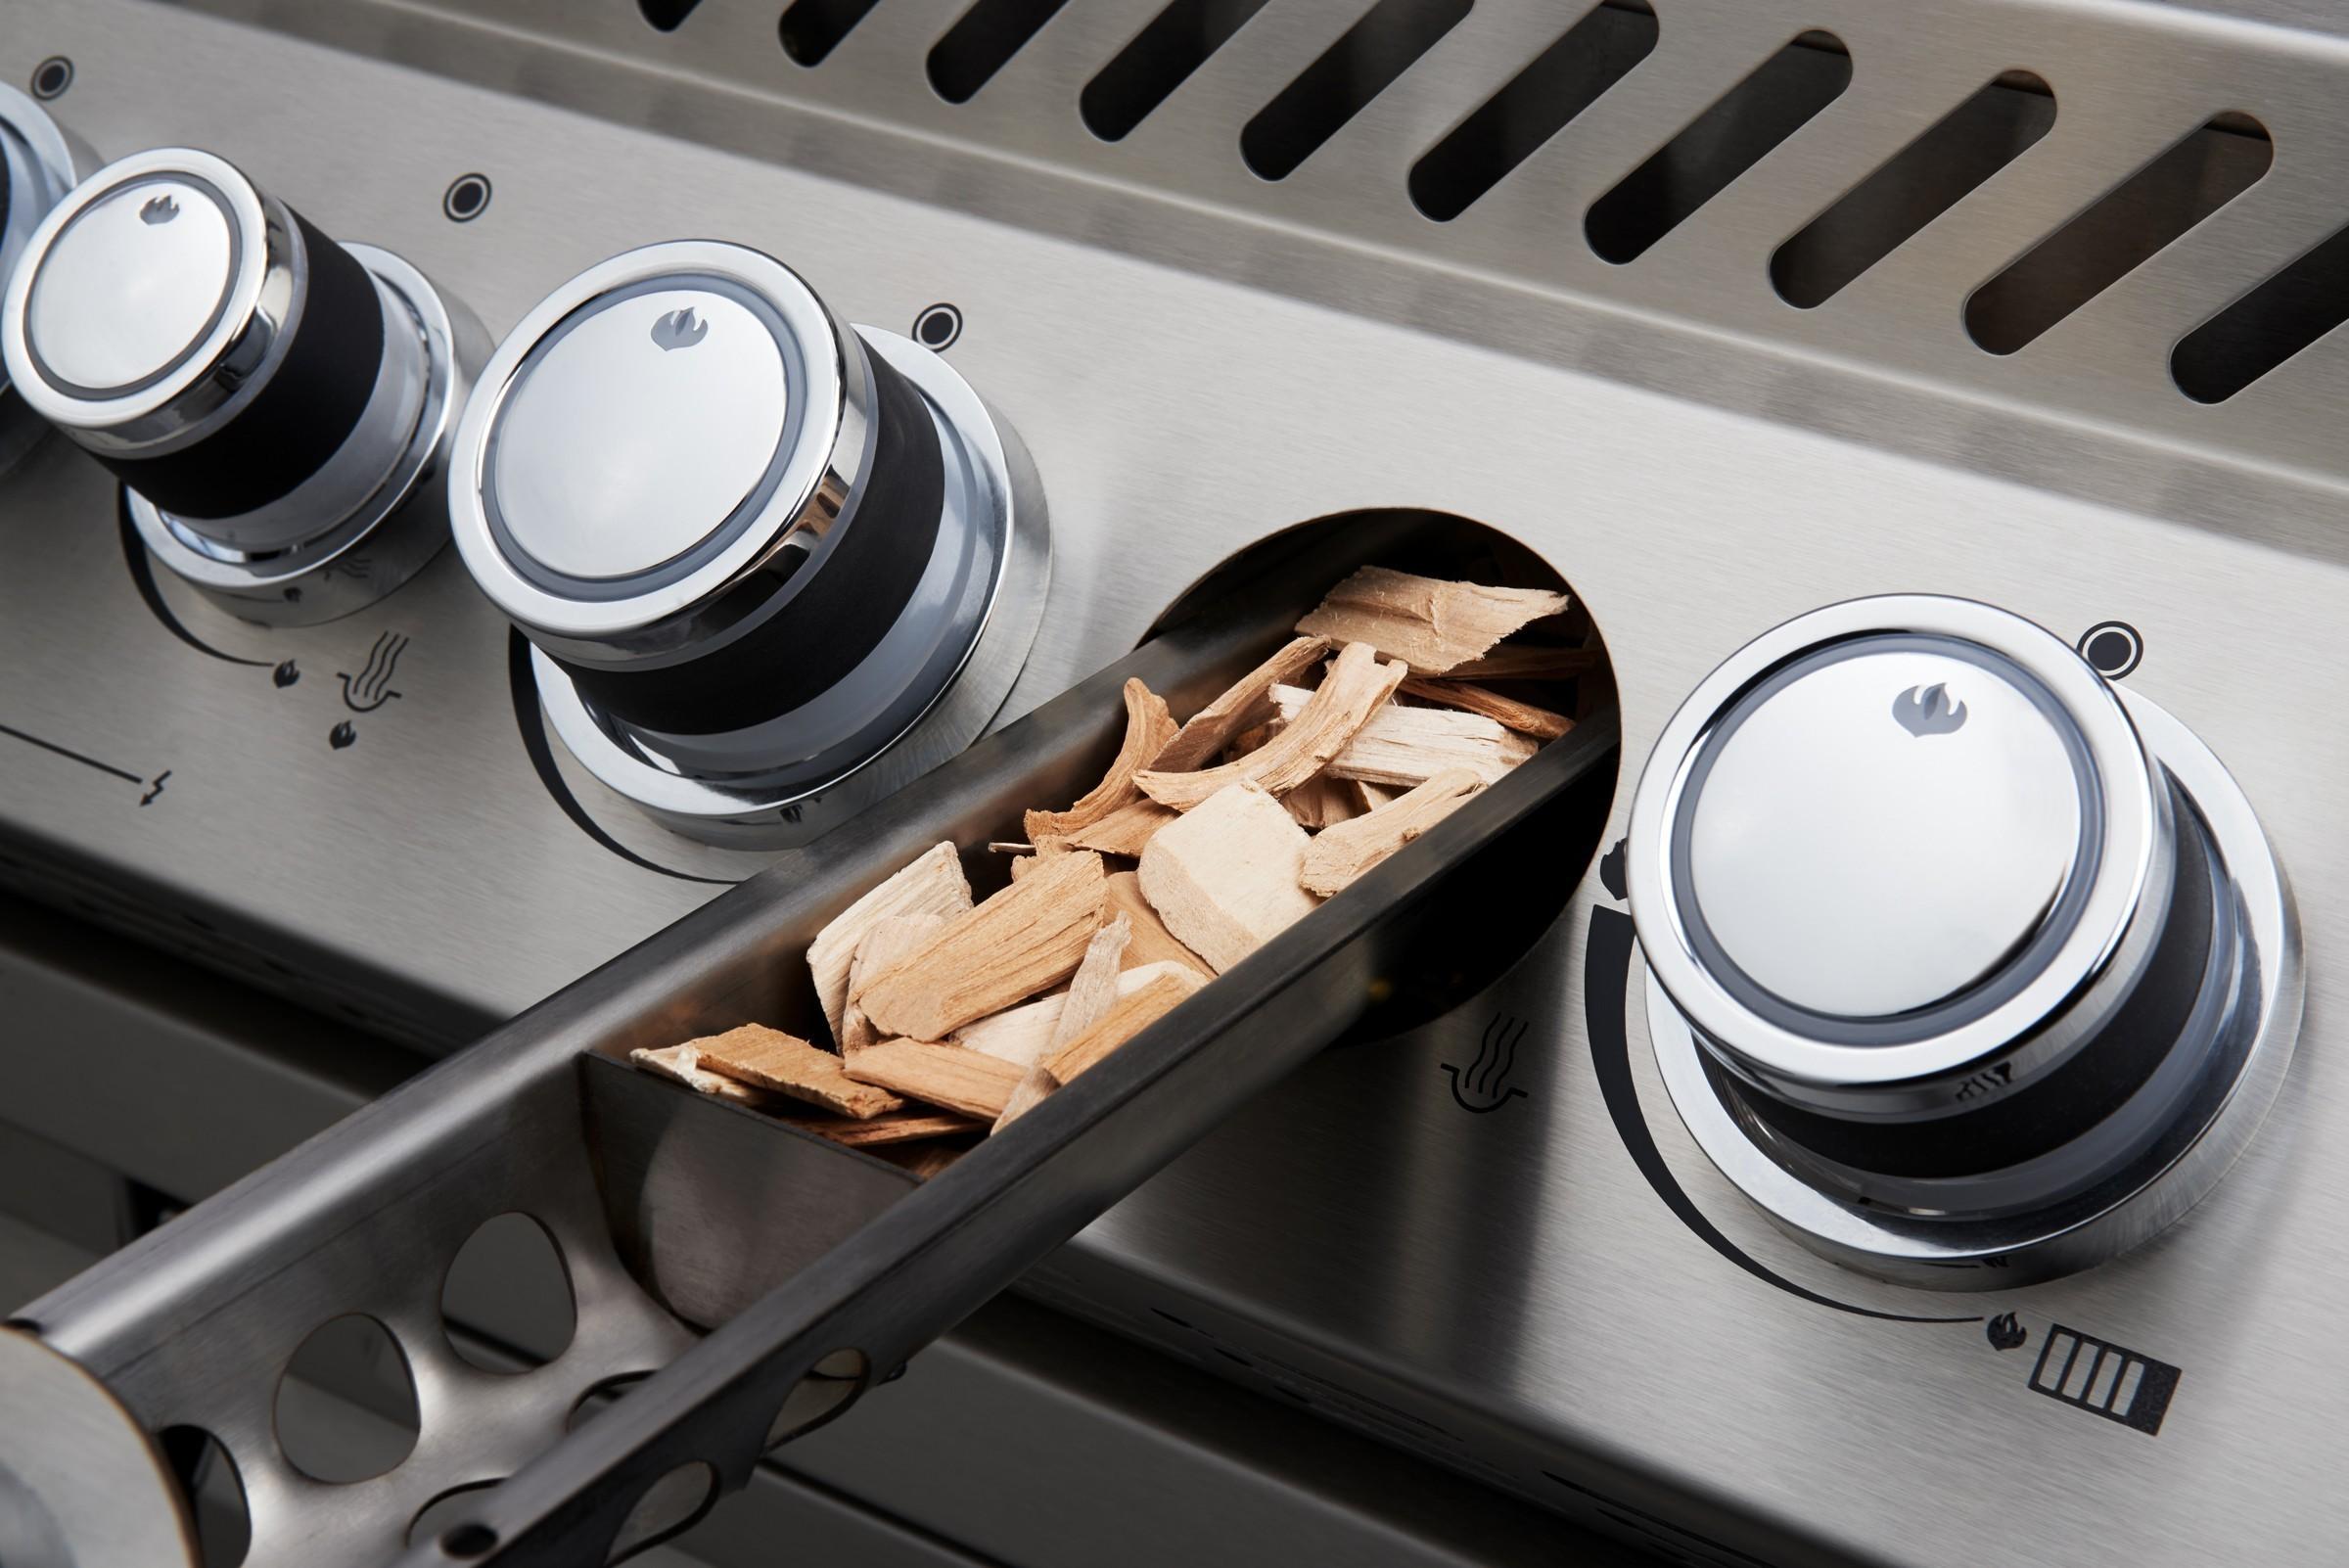 Grillmatte Für Gasgrill : Gasgrill grillwagen napoleon prestige pro edelstahl